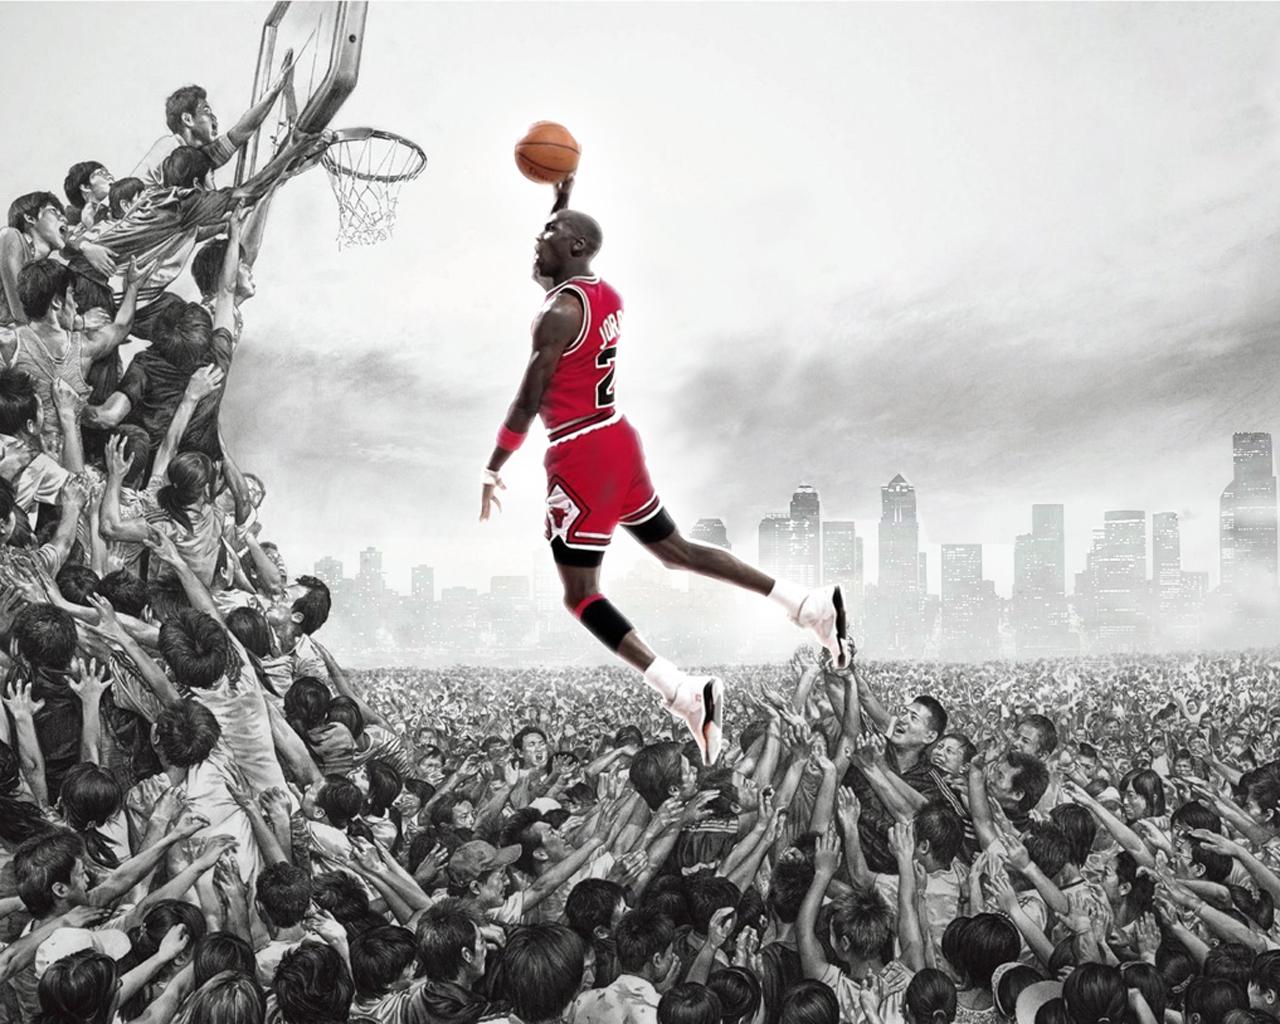 Awesome Air Jordan wallpaper 1280x1024 33087 1280x1024